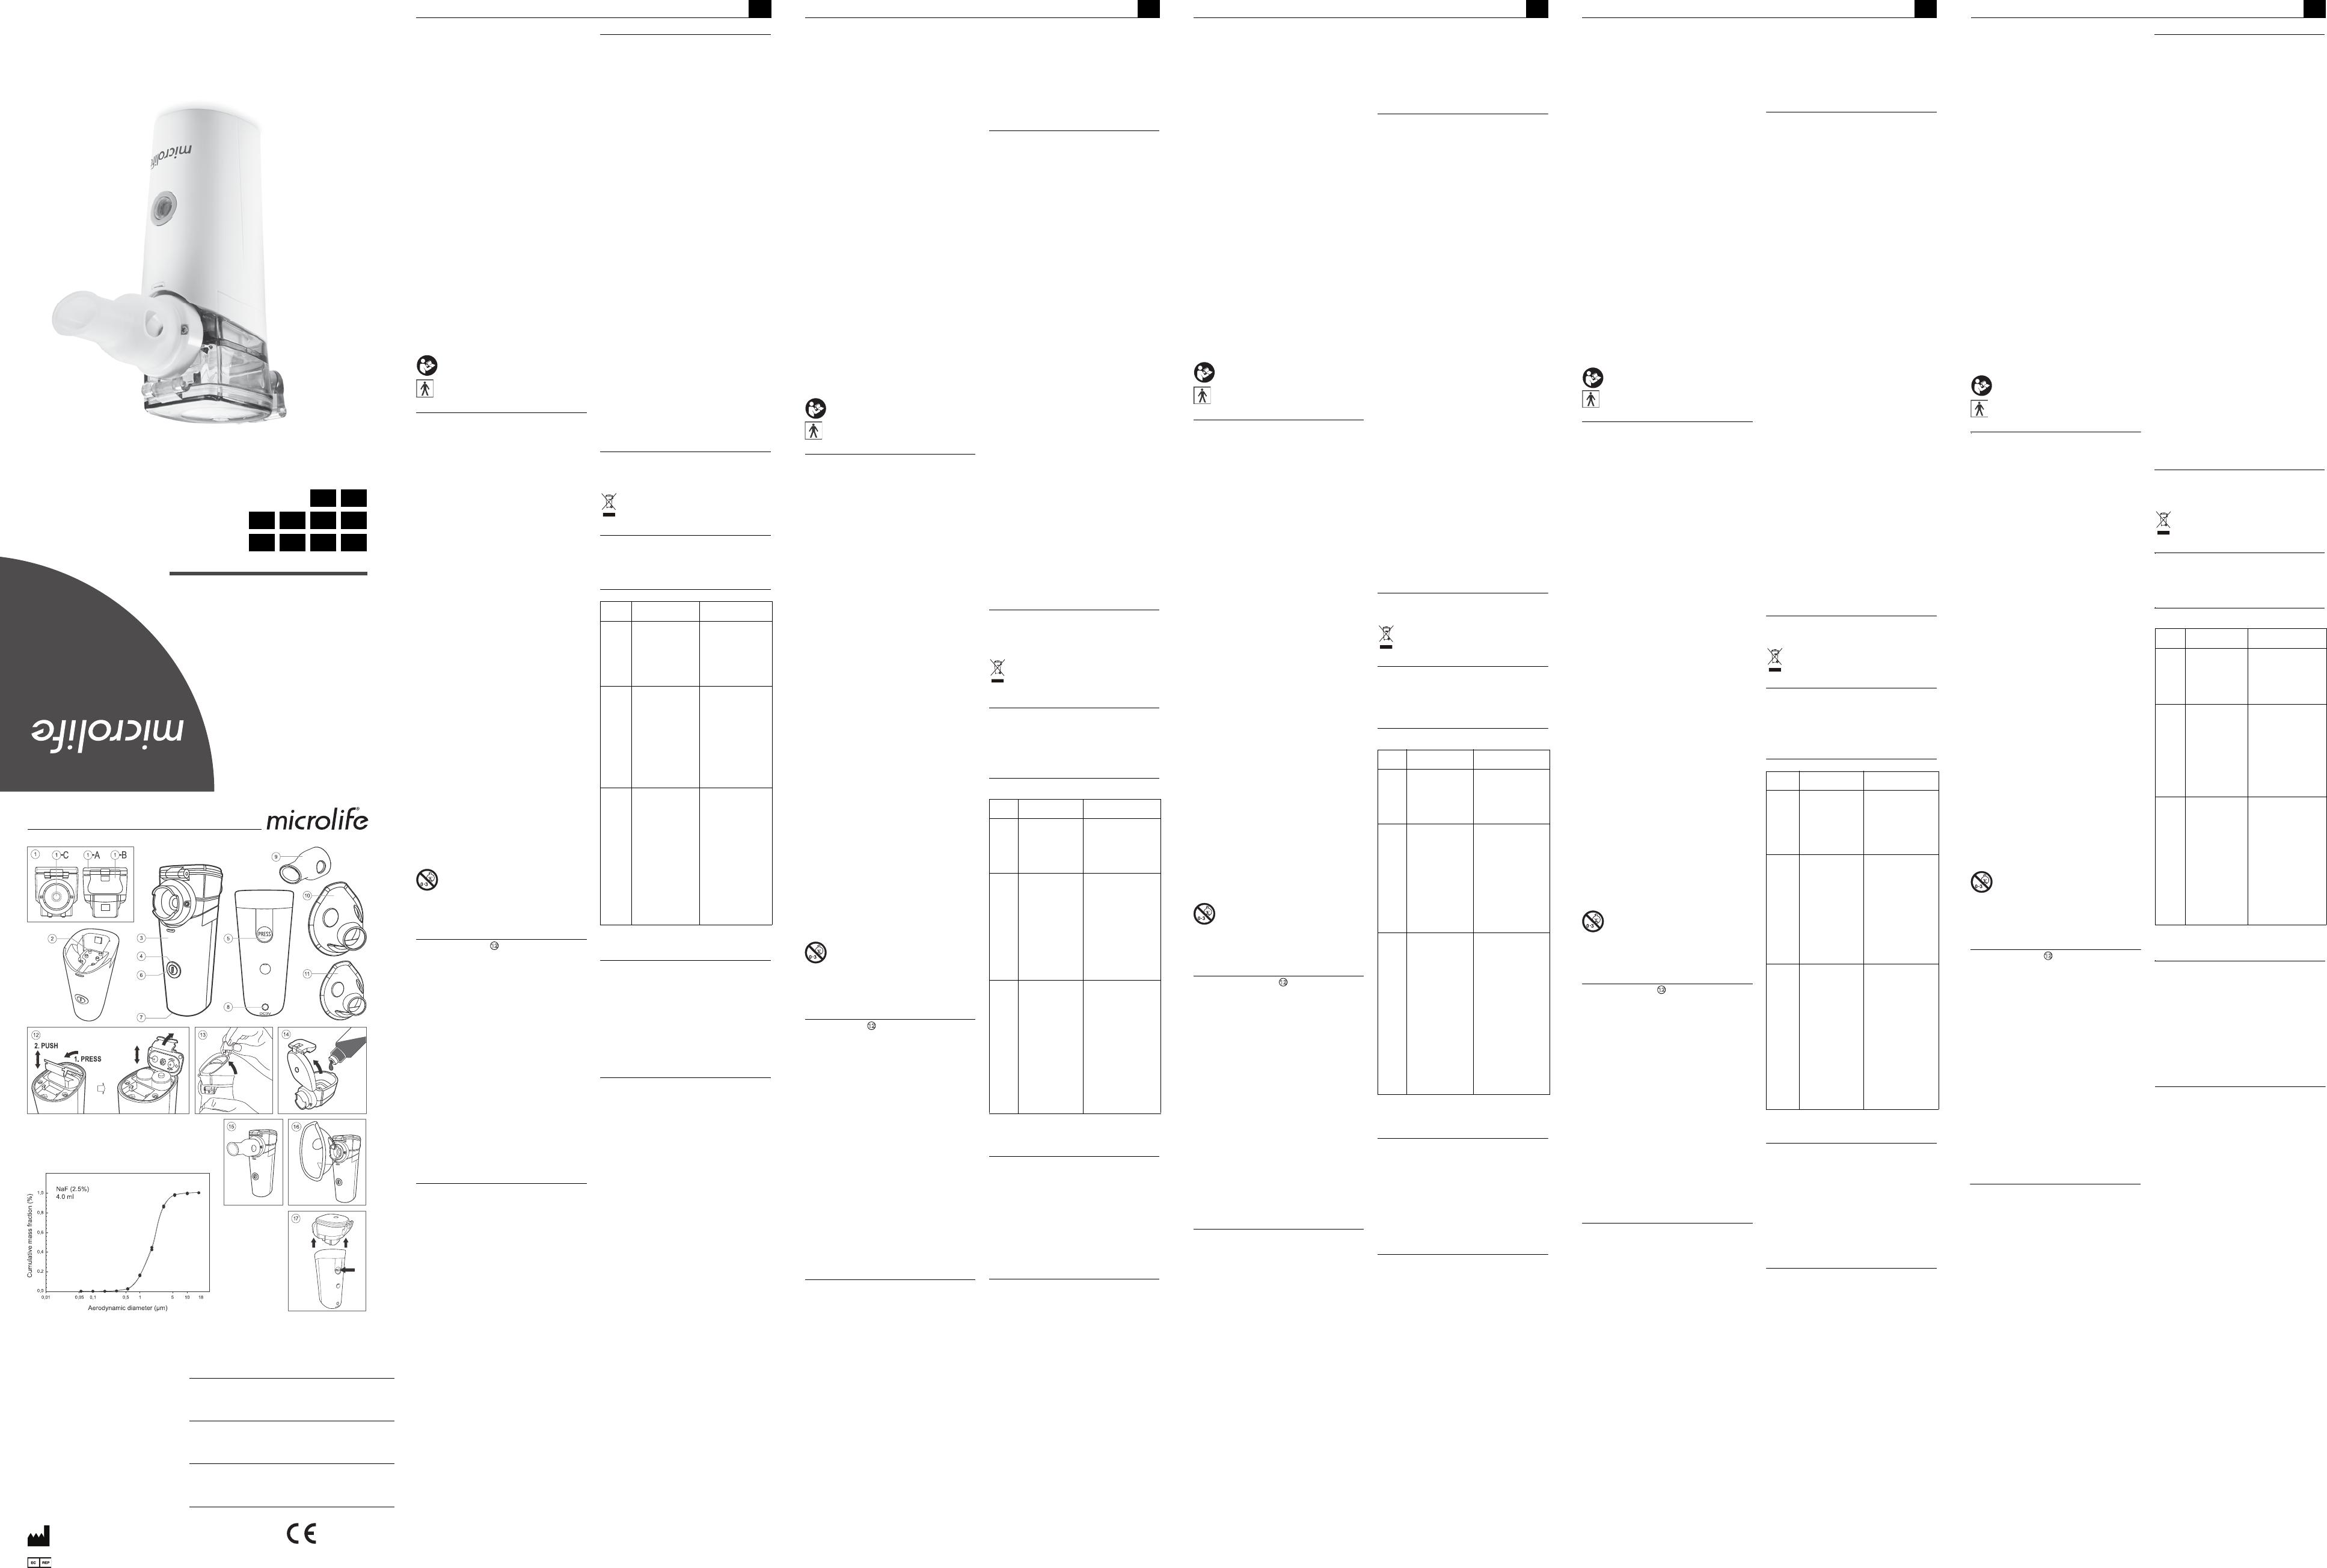 Handleiding Microlife NEB 19 (pagina 19 van 19) (Deutsch, English